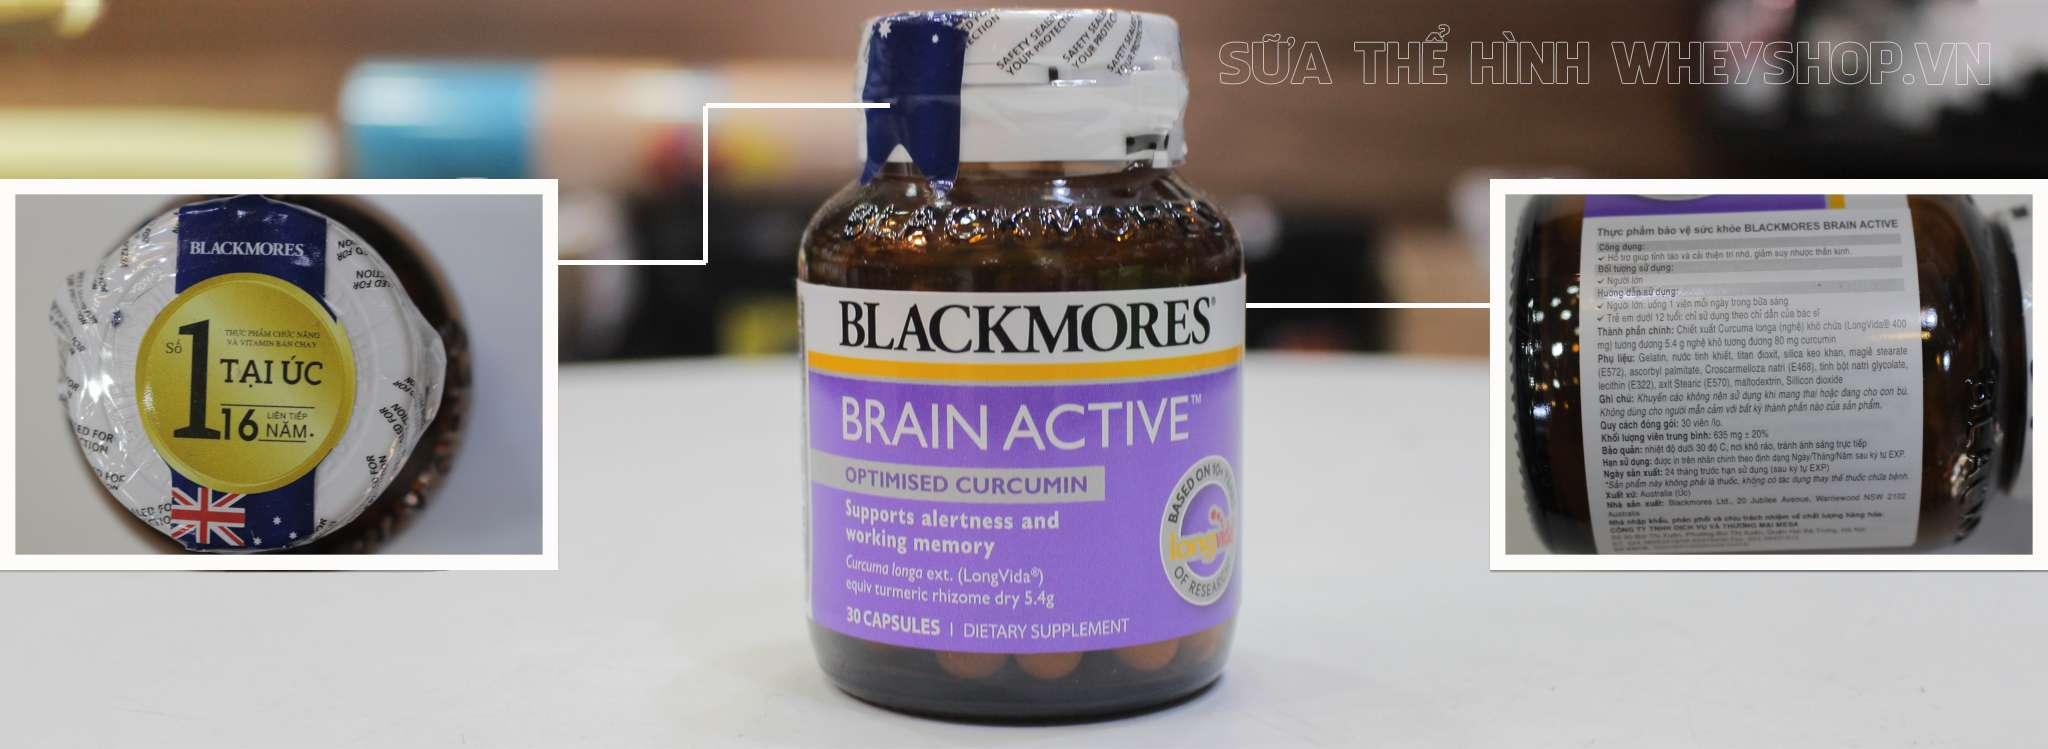 Blackmores Brain Active 30 Vien tem nhan hieu chinh hang tai wheyshop